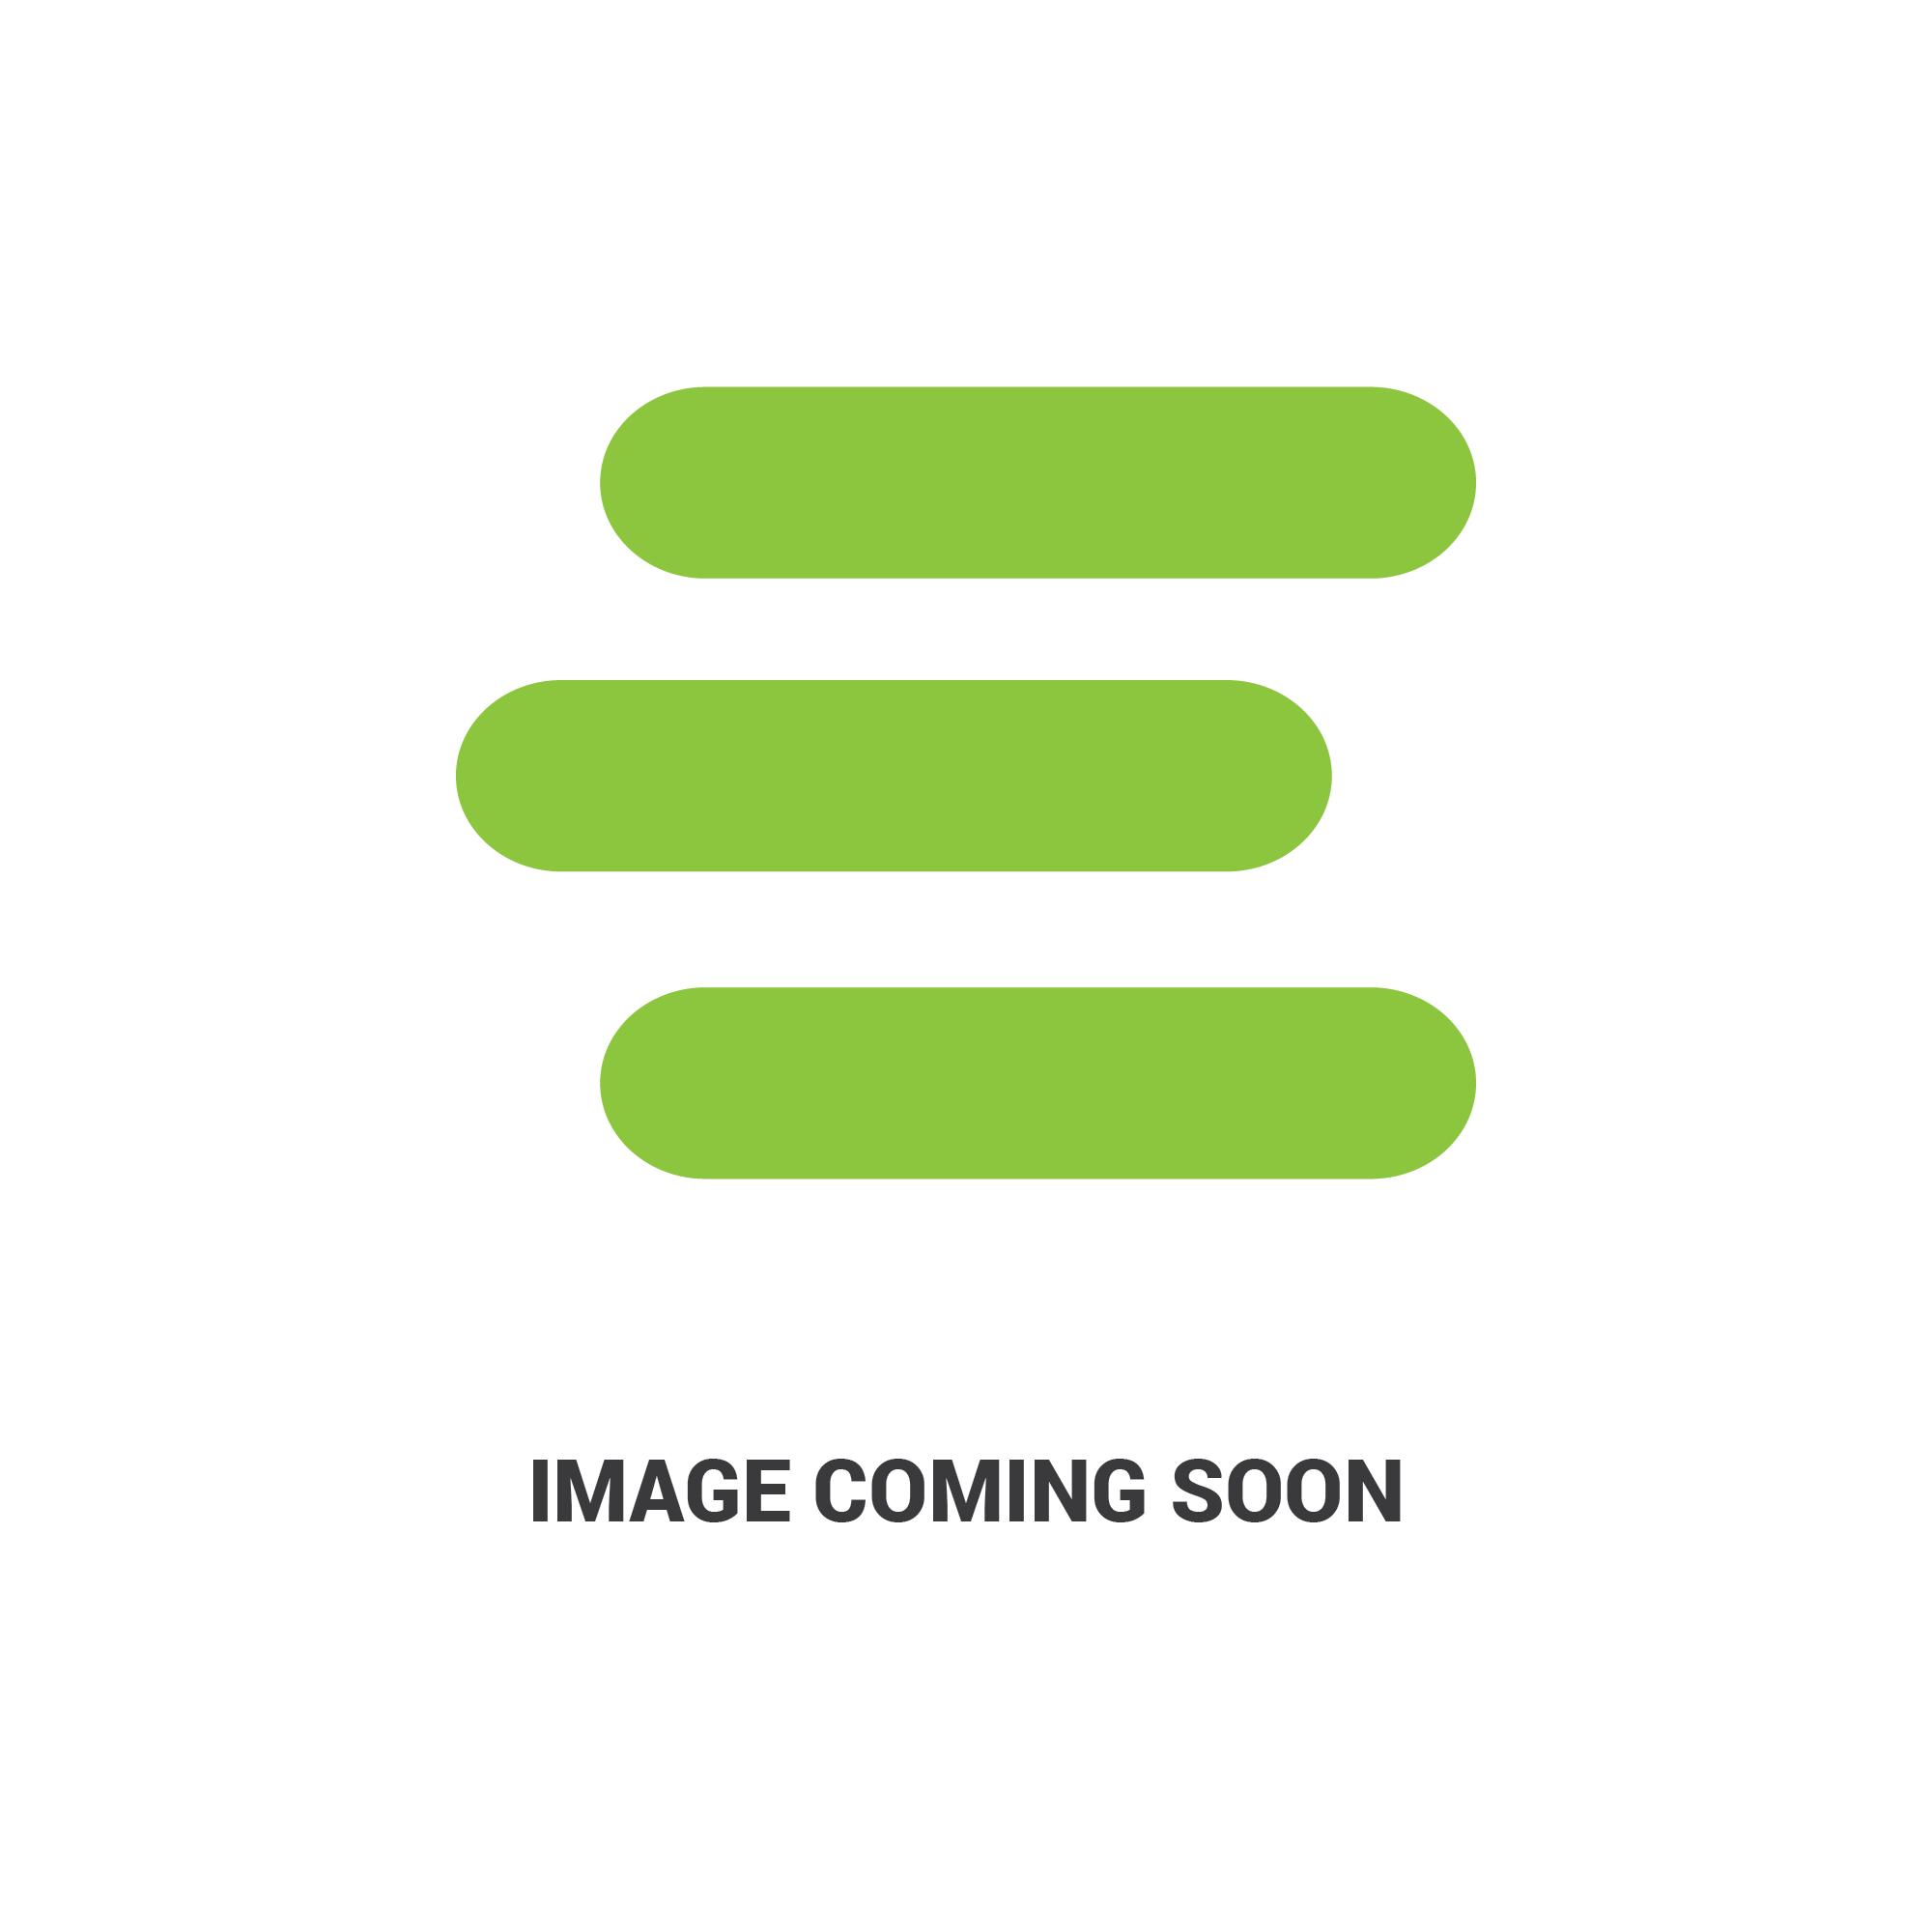 E-15471-12230edit 140.jpg